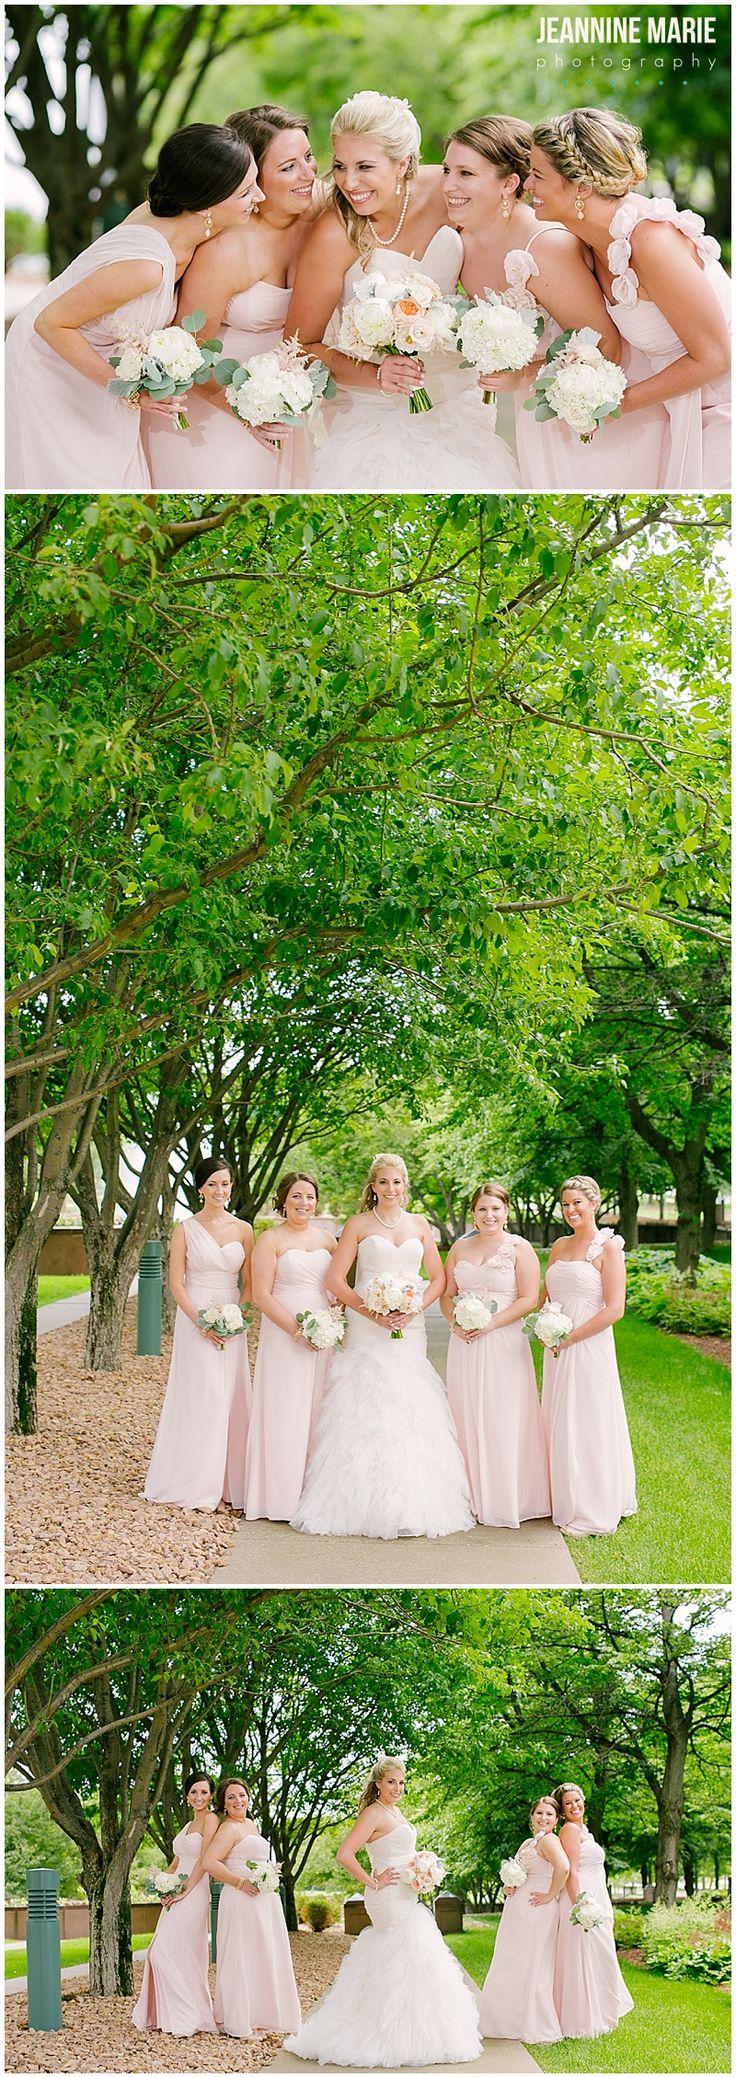 Bridesmaids portraits at CarlsonTowers in Minnetonka MN